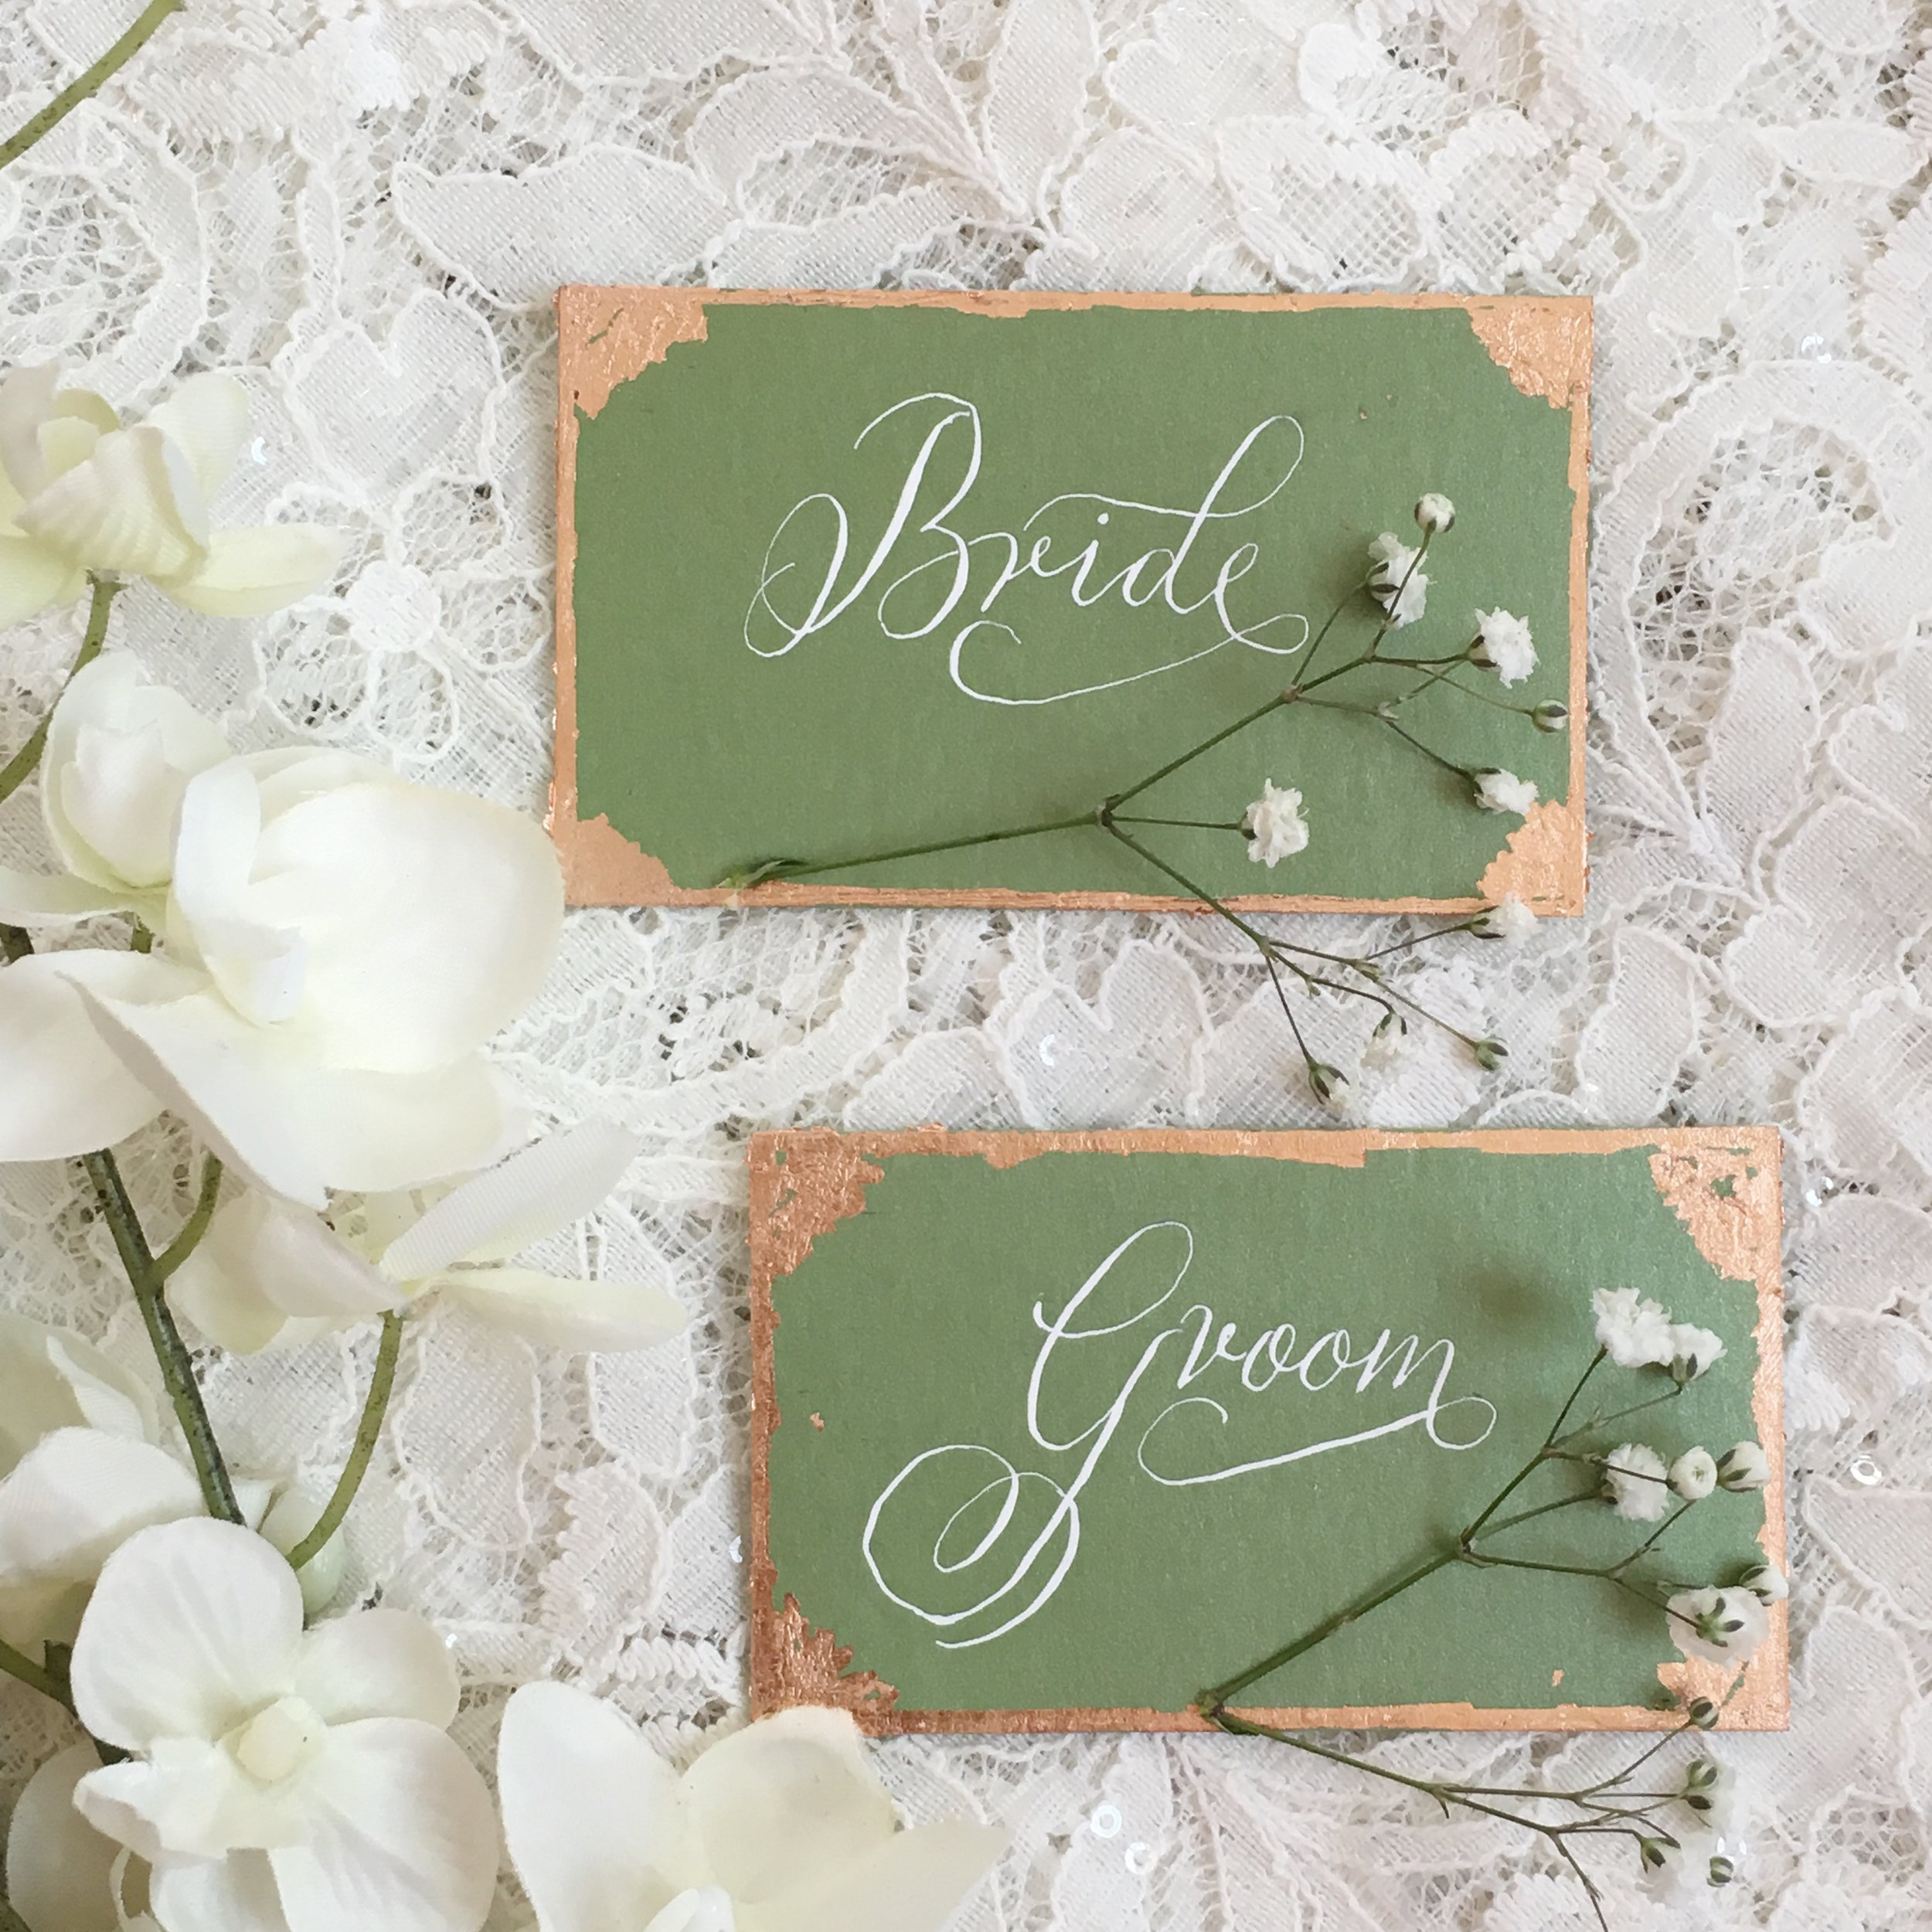 Central PA, York PA, JesSmith Designs, custom, wedding, invitations, bridal, announcements, save the date-02-02 20.29.26.jpg